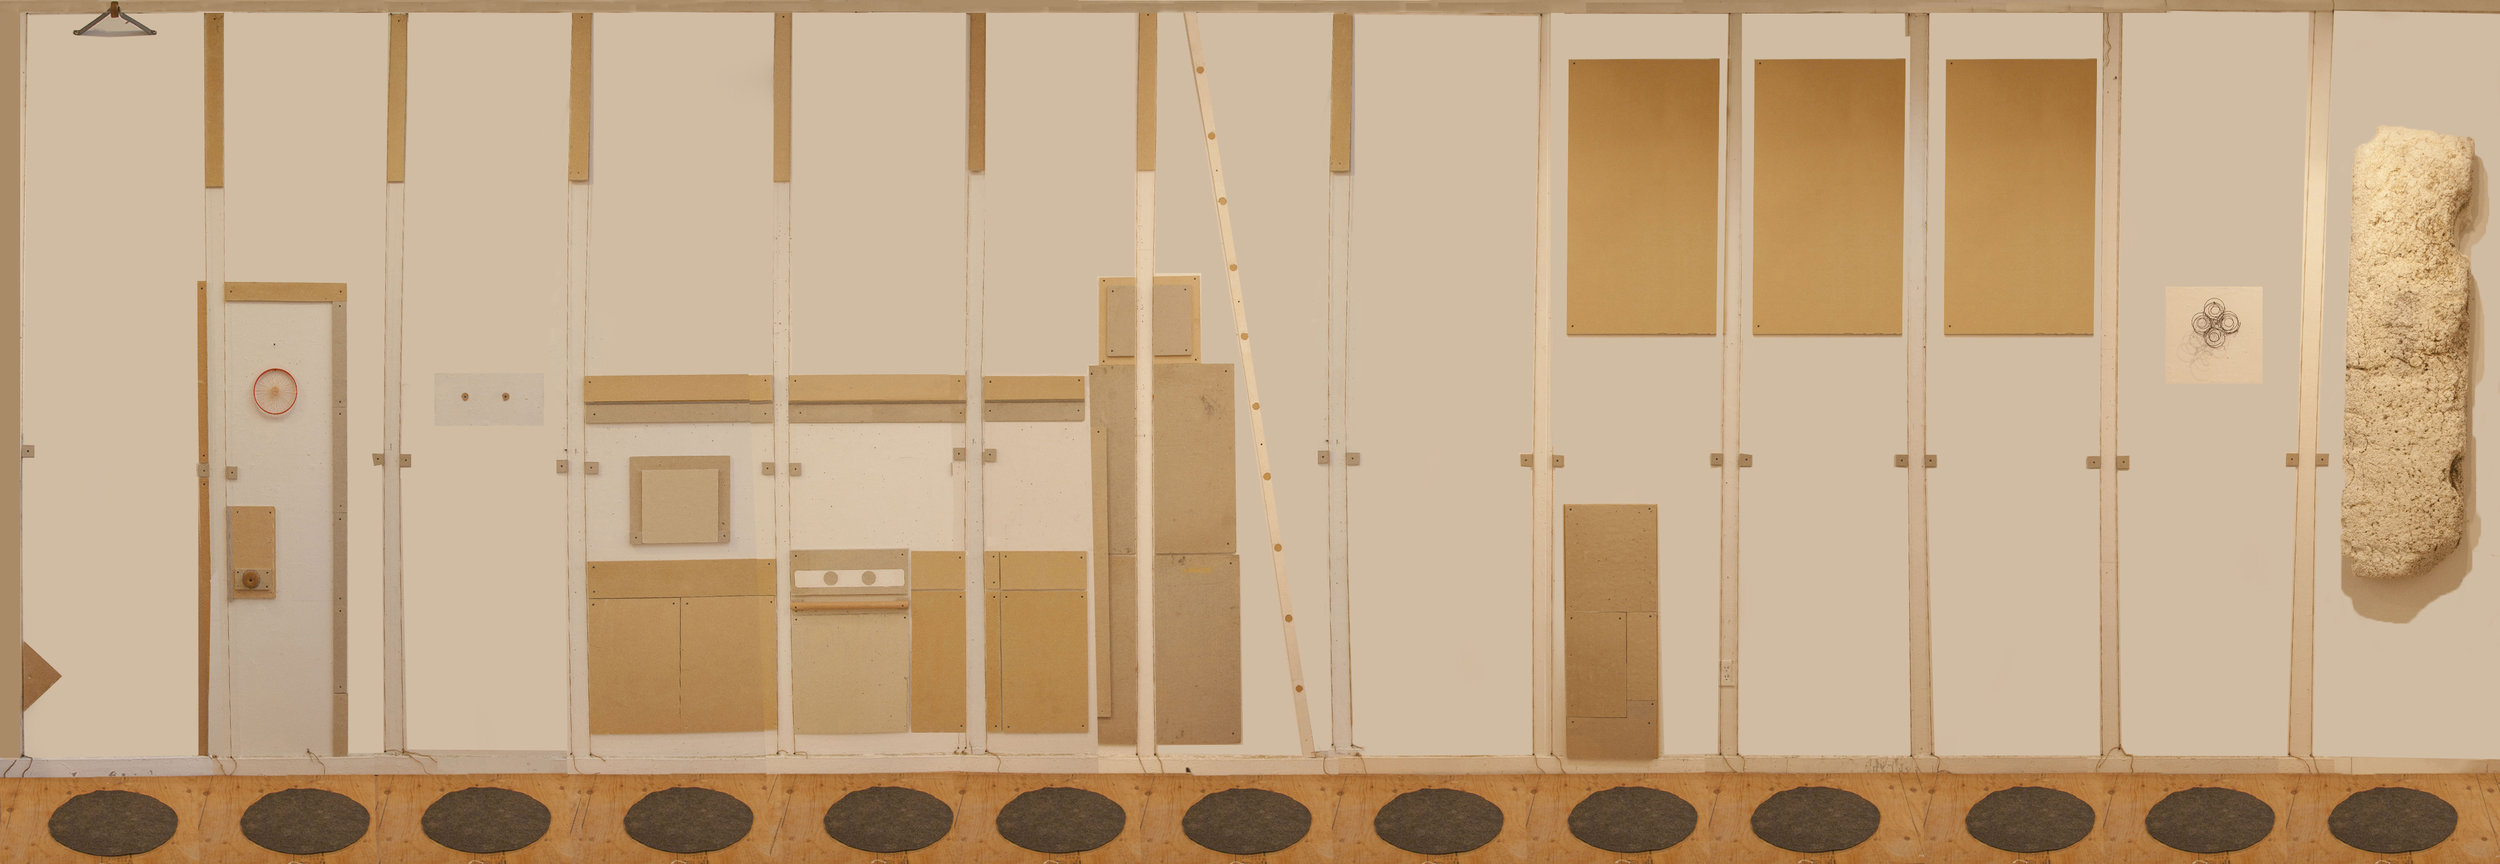 Composite photograph of studio installation